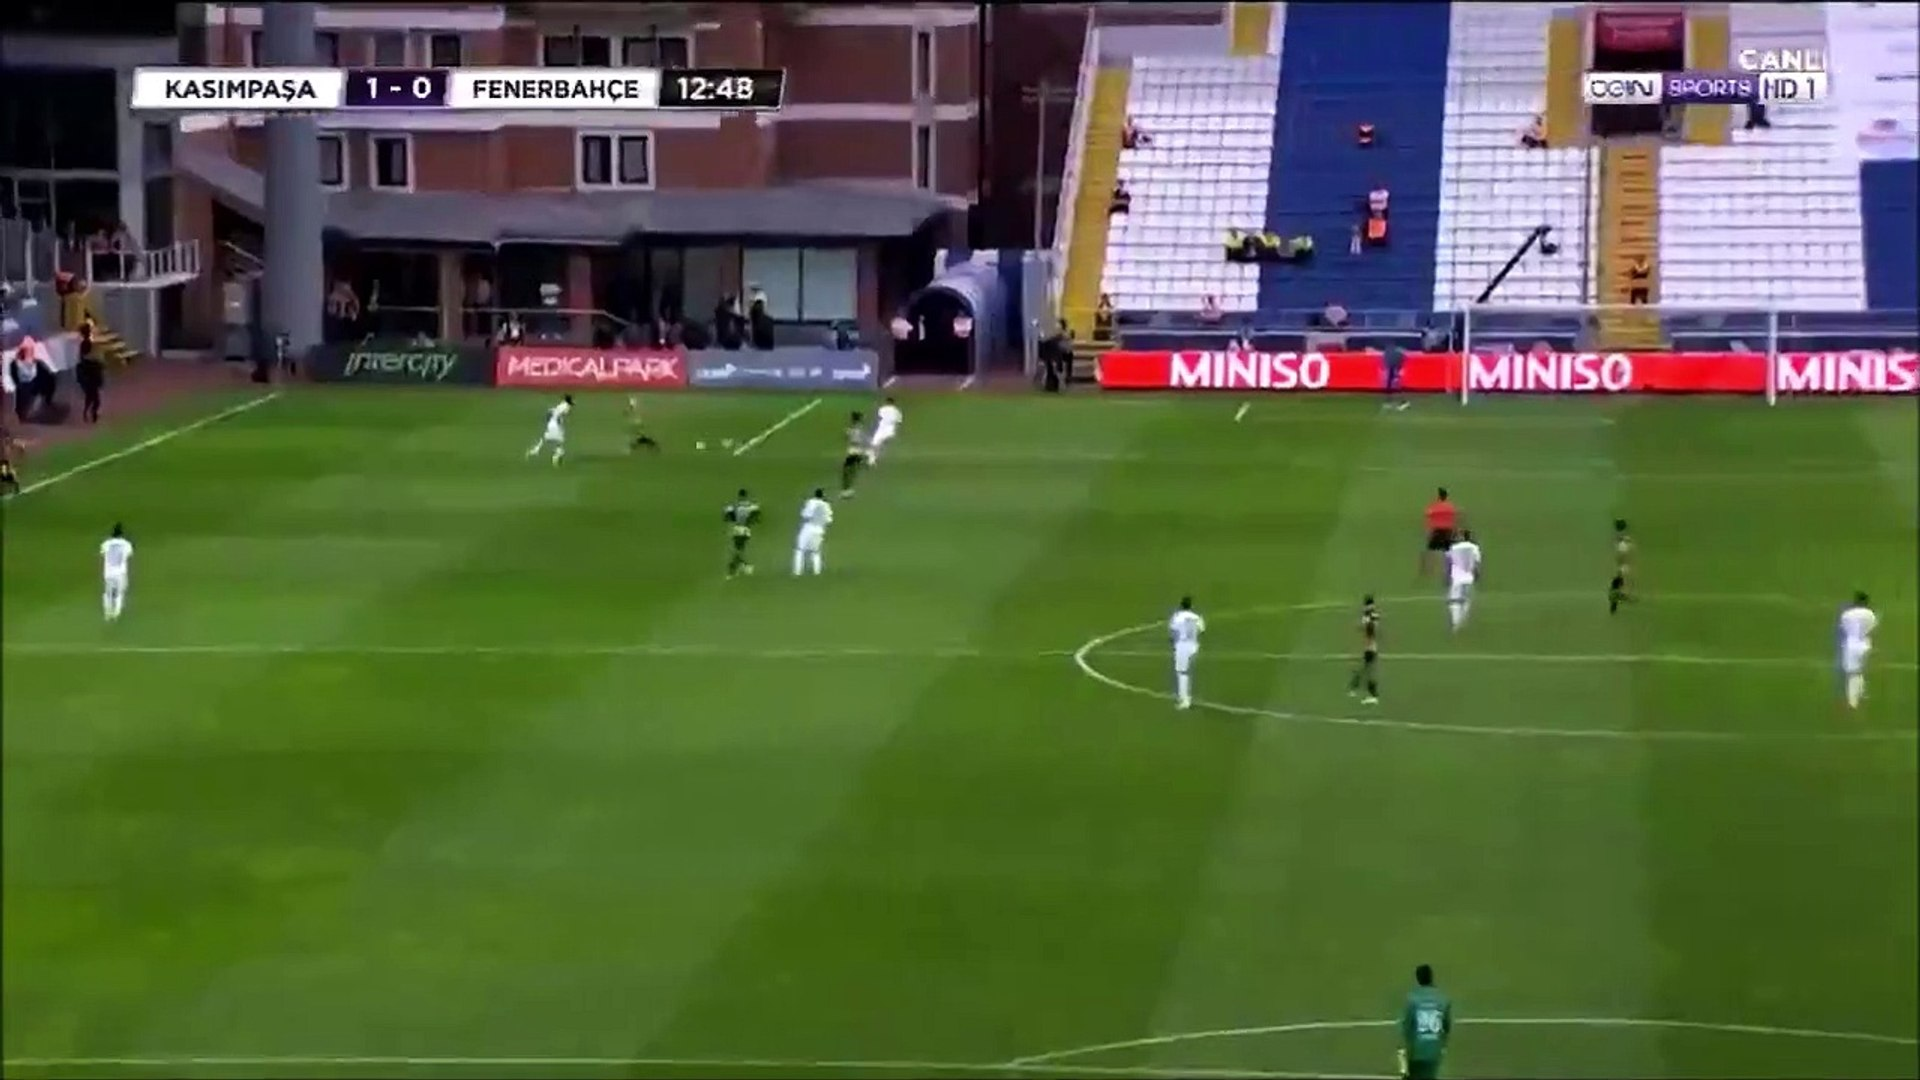 Kasimpasa 1-0 Fenerbahçe - Harun Tekin funny own goal - video dailymotion